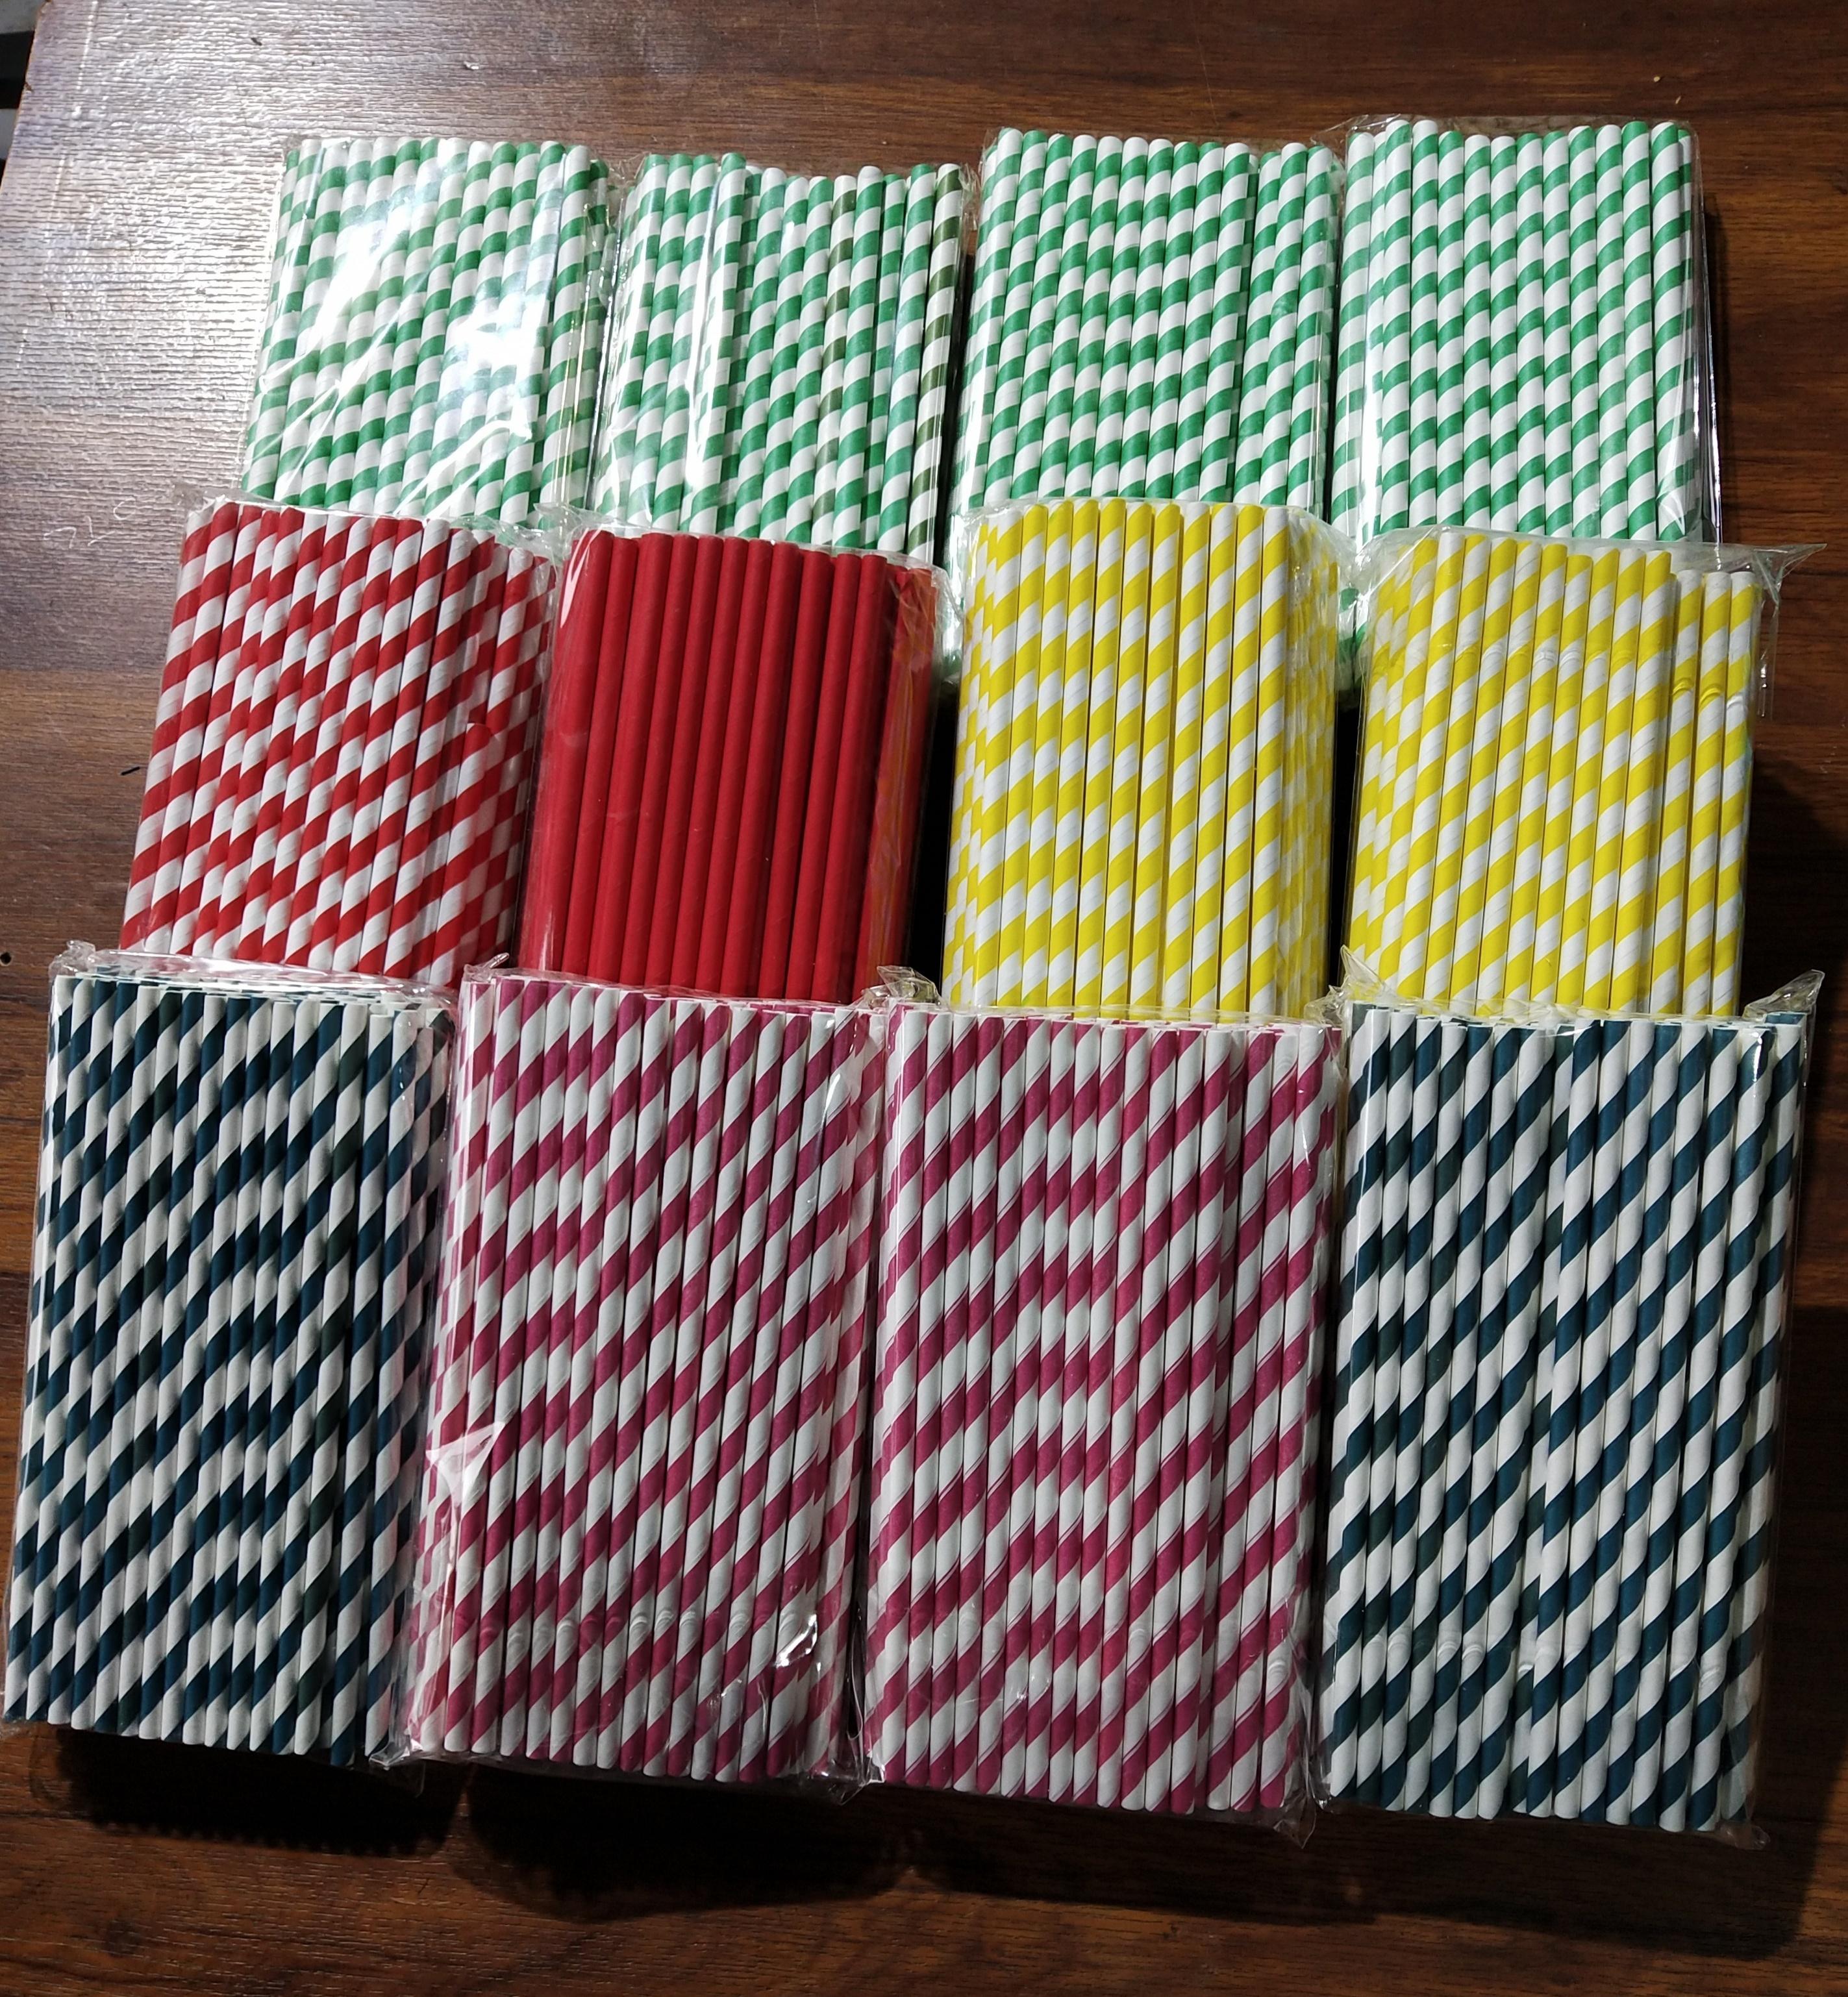 8 mm paper straws